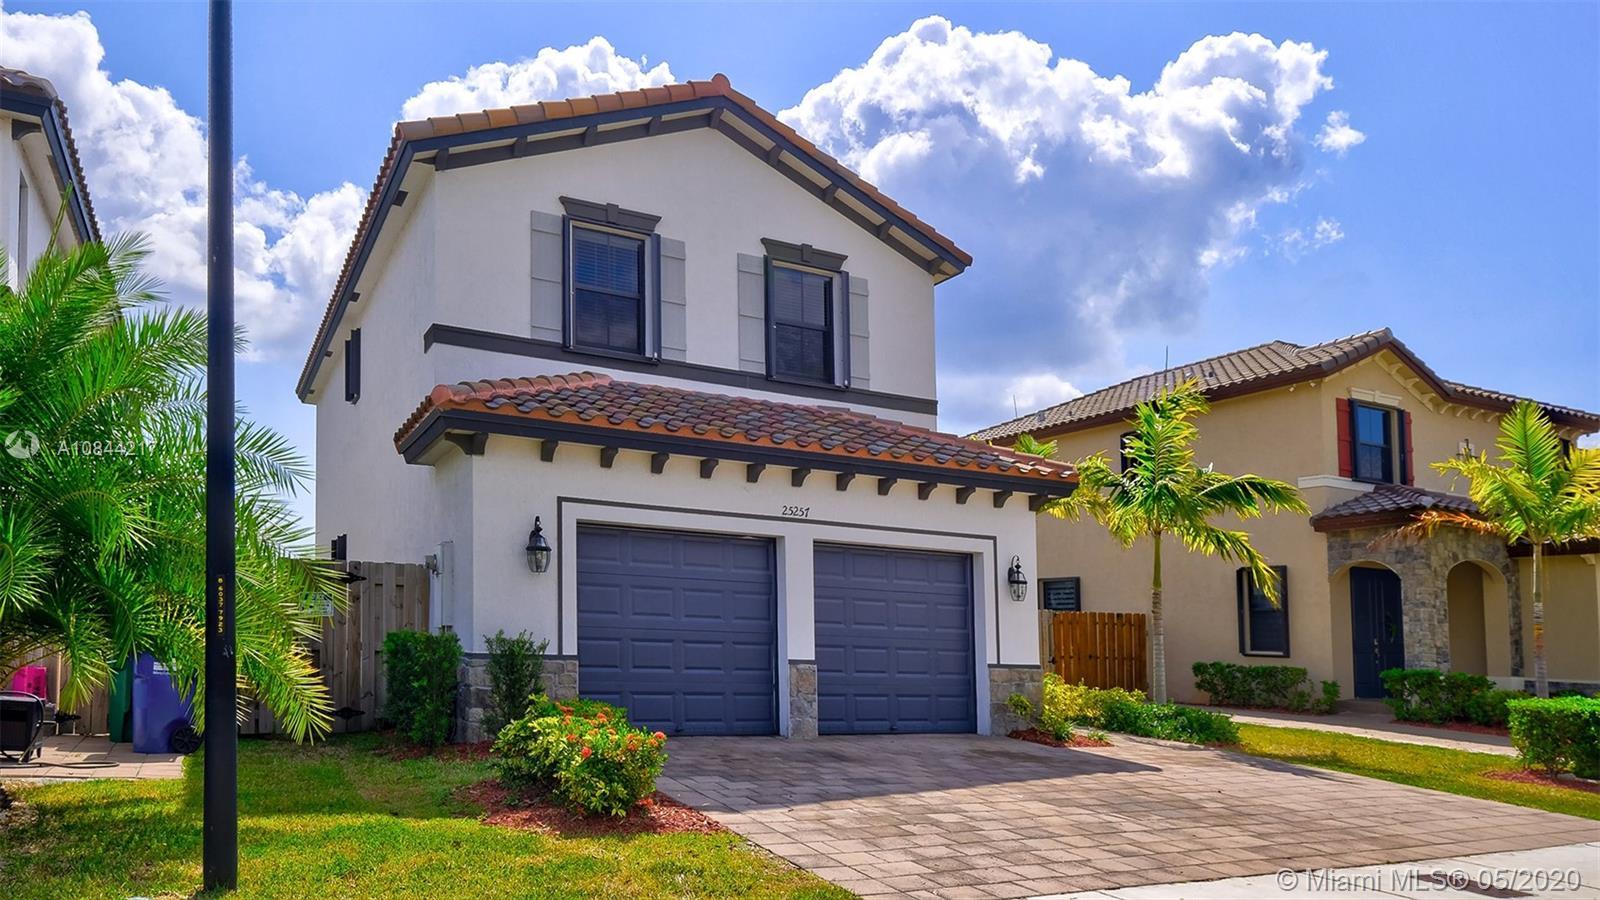 25257 SW 117th Pl, Homestead, FL 33032 - Homestead, FL real estate listing